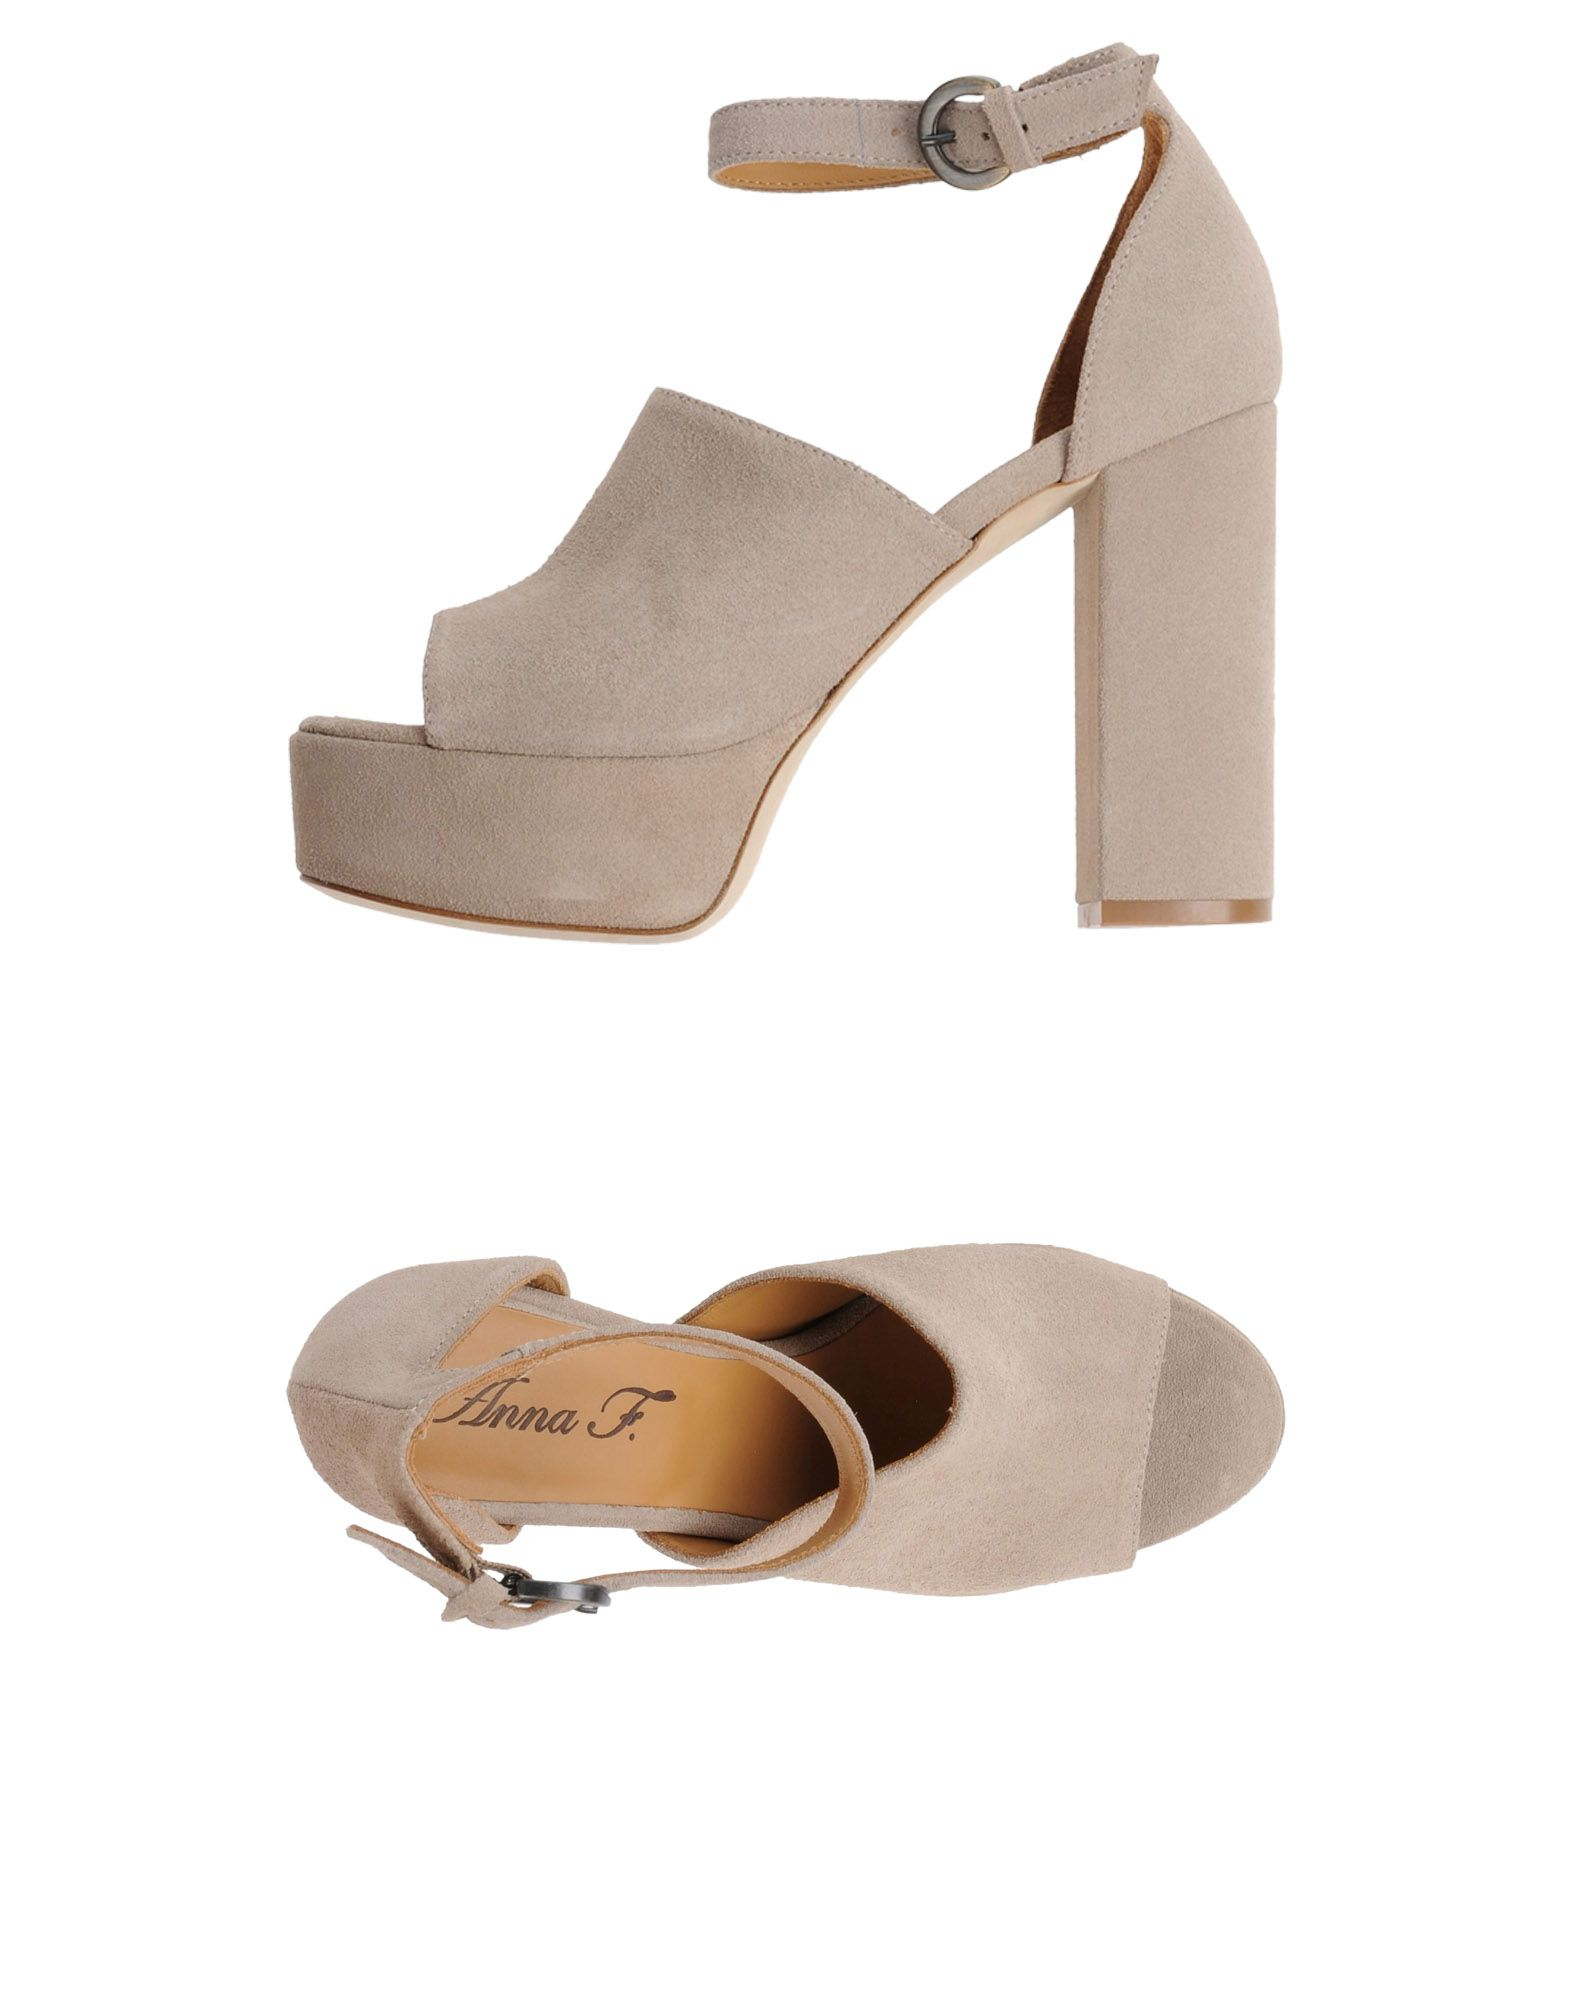 Anna F. Sandalen Damen  11191843SD Gute Qualität beliebte Schuhe